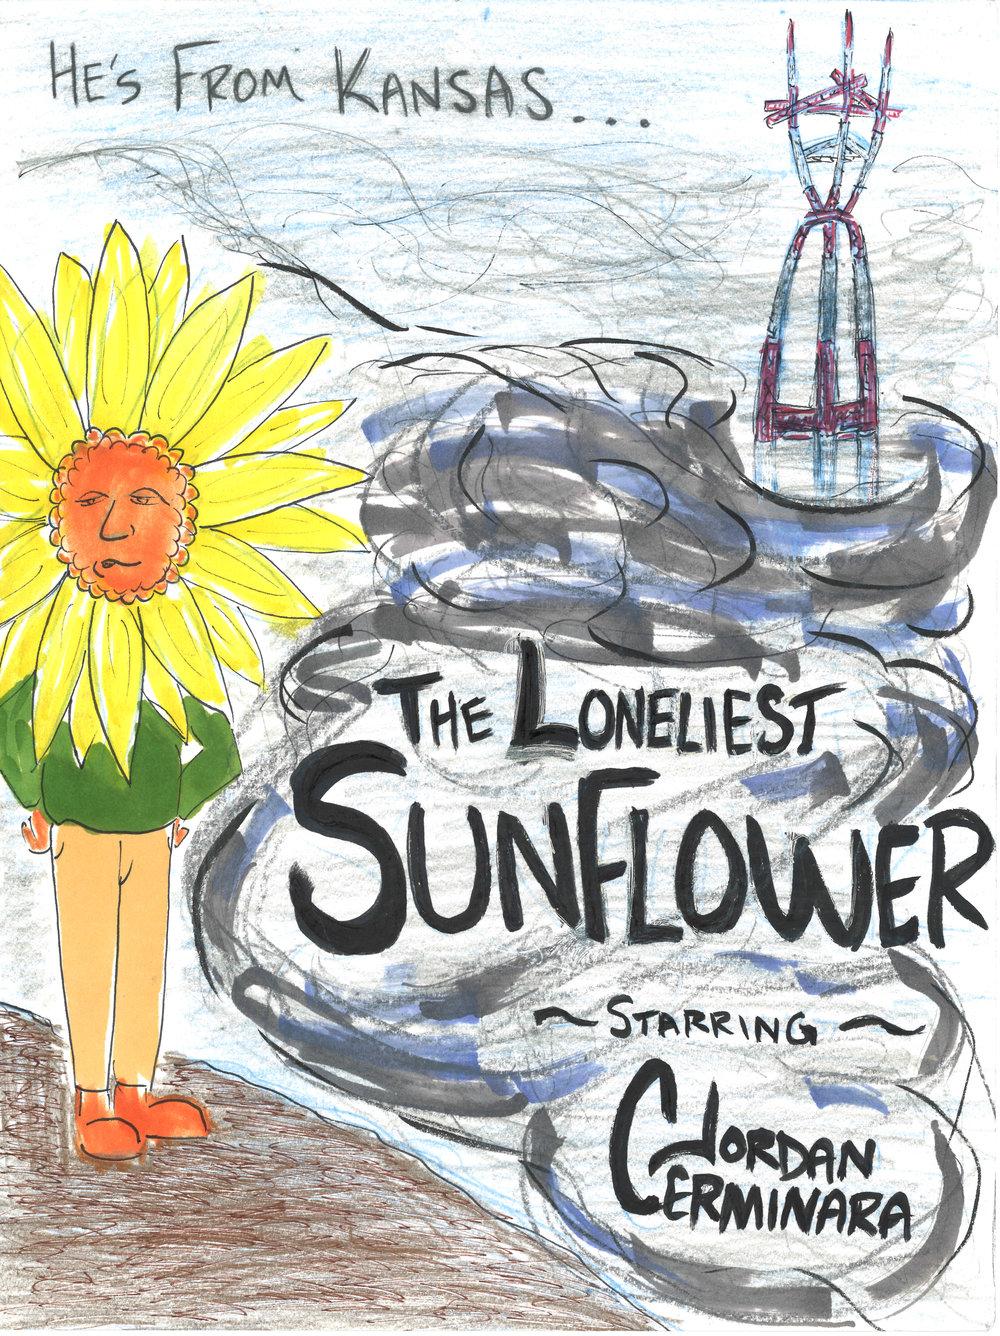 LonliestSunflower.jpg